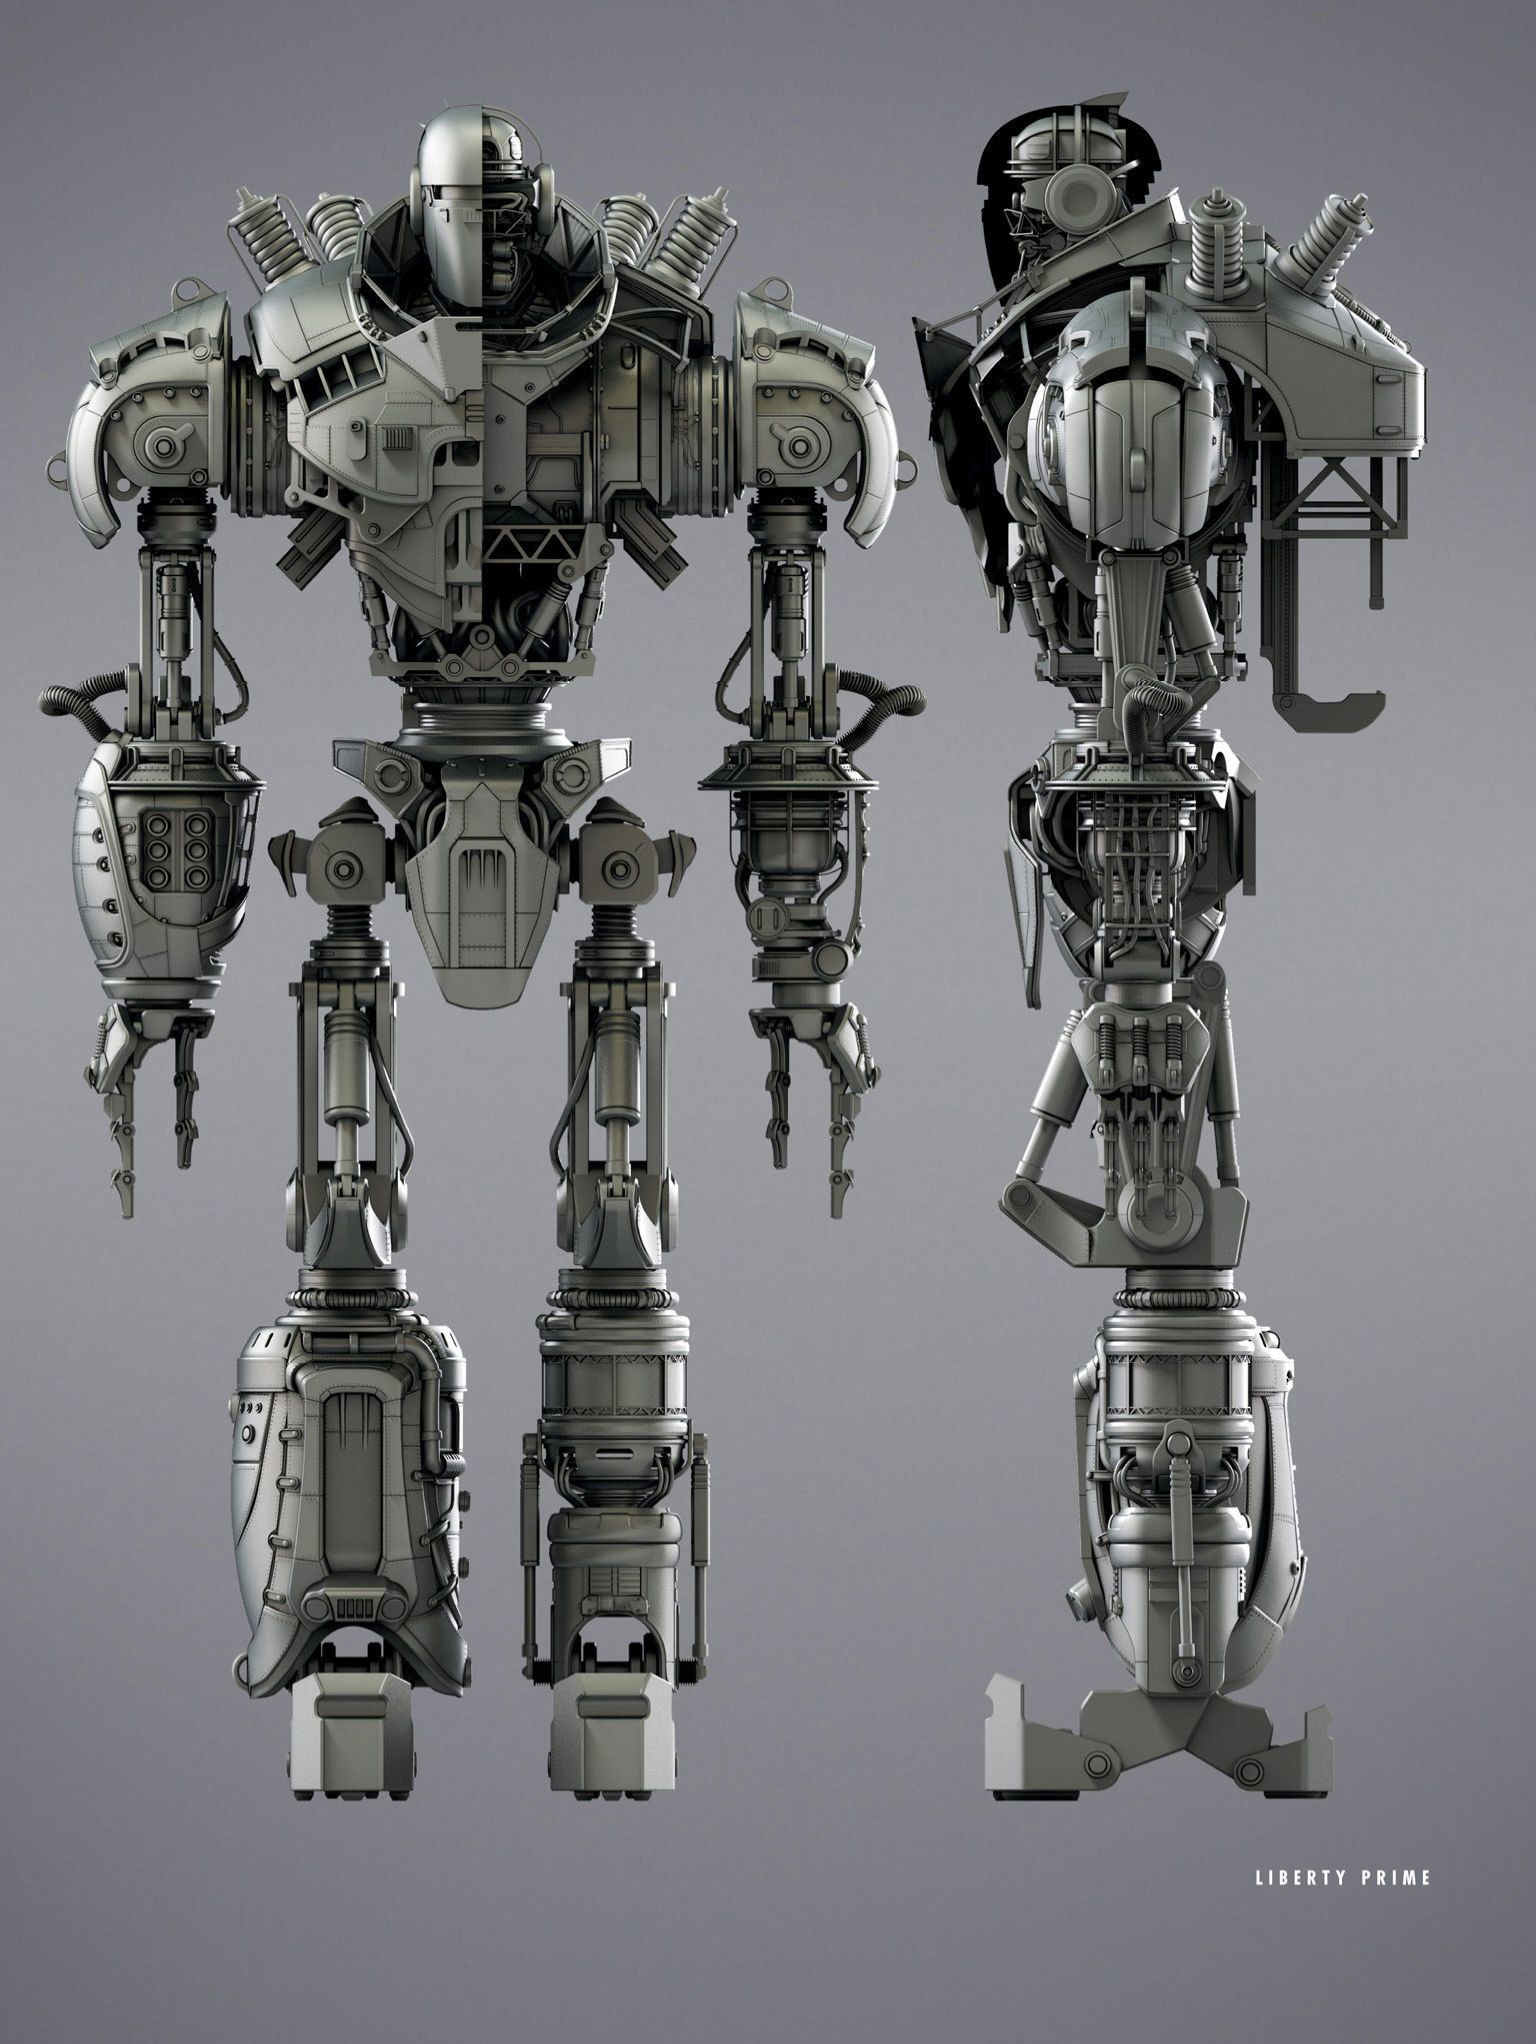 Res: 1536x2044, Fallout 4 | Concept Liberty Prime